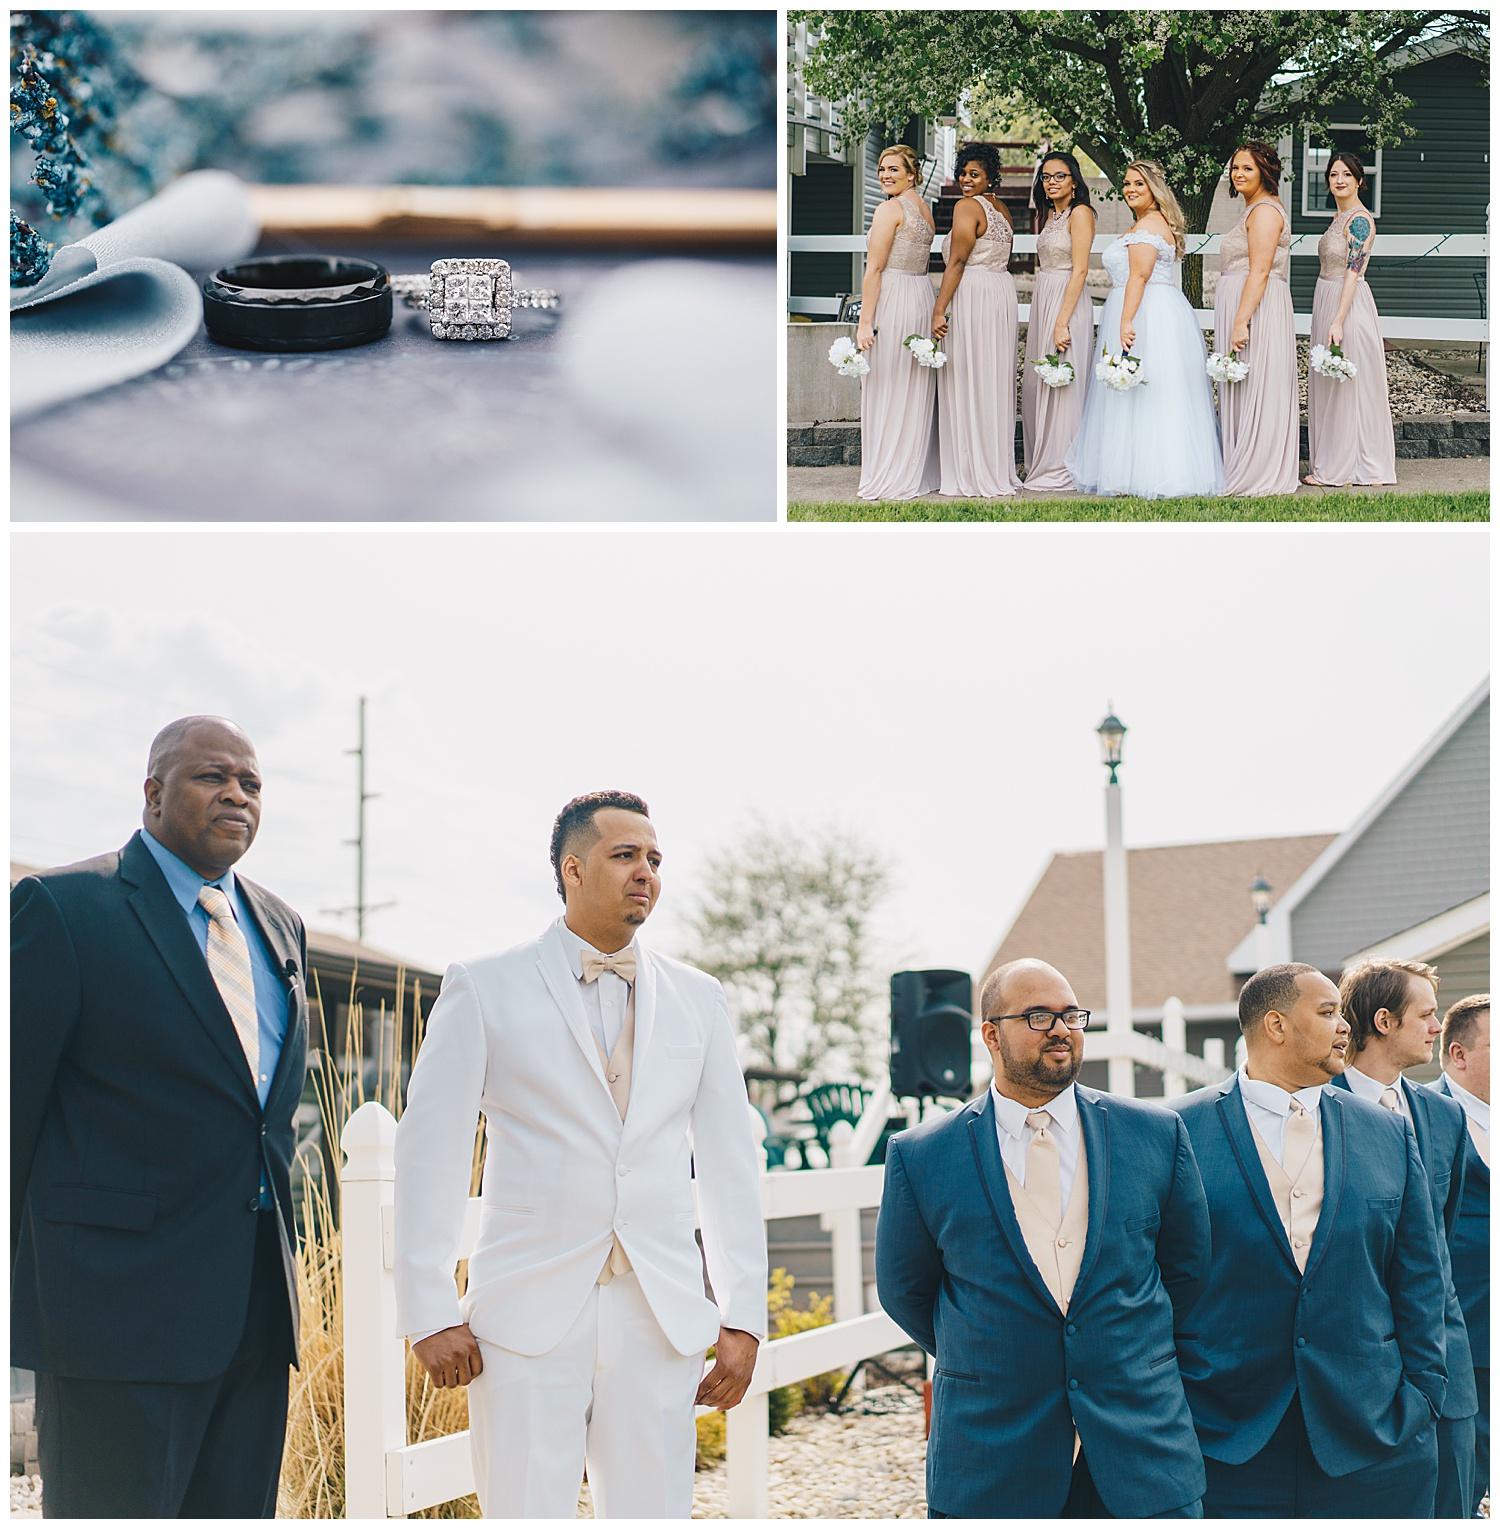 Franklin Tennessee Wedding Photographer // Nashville Tennessee Wedding Photographer